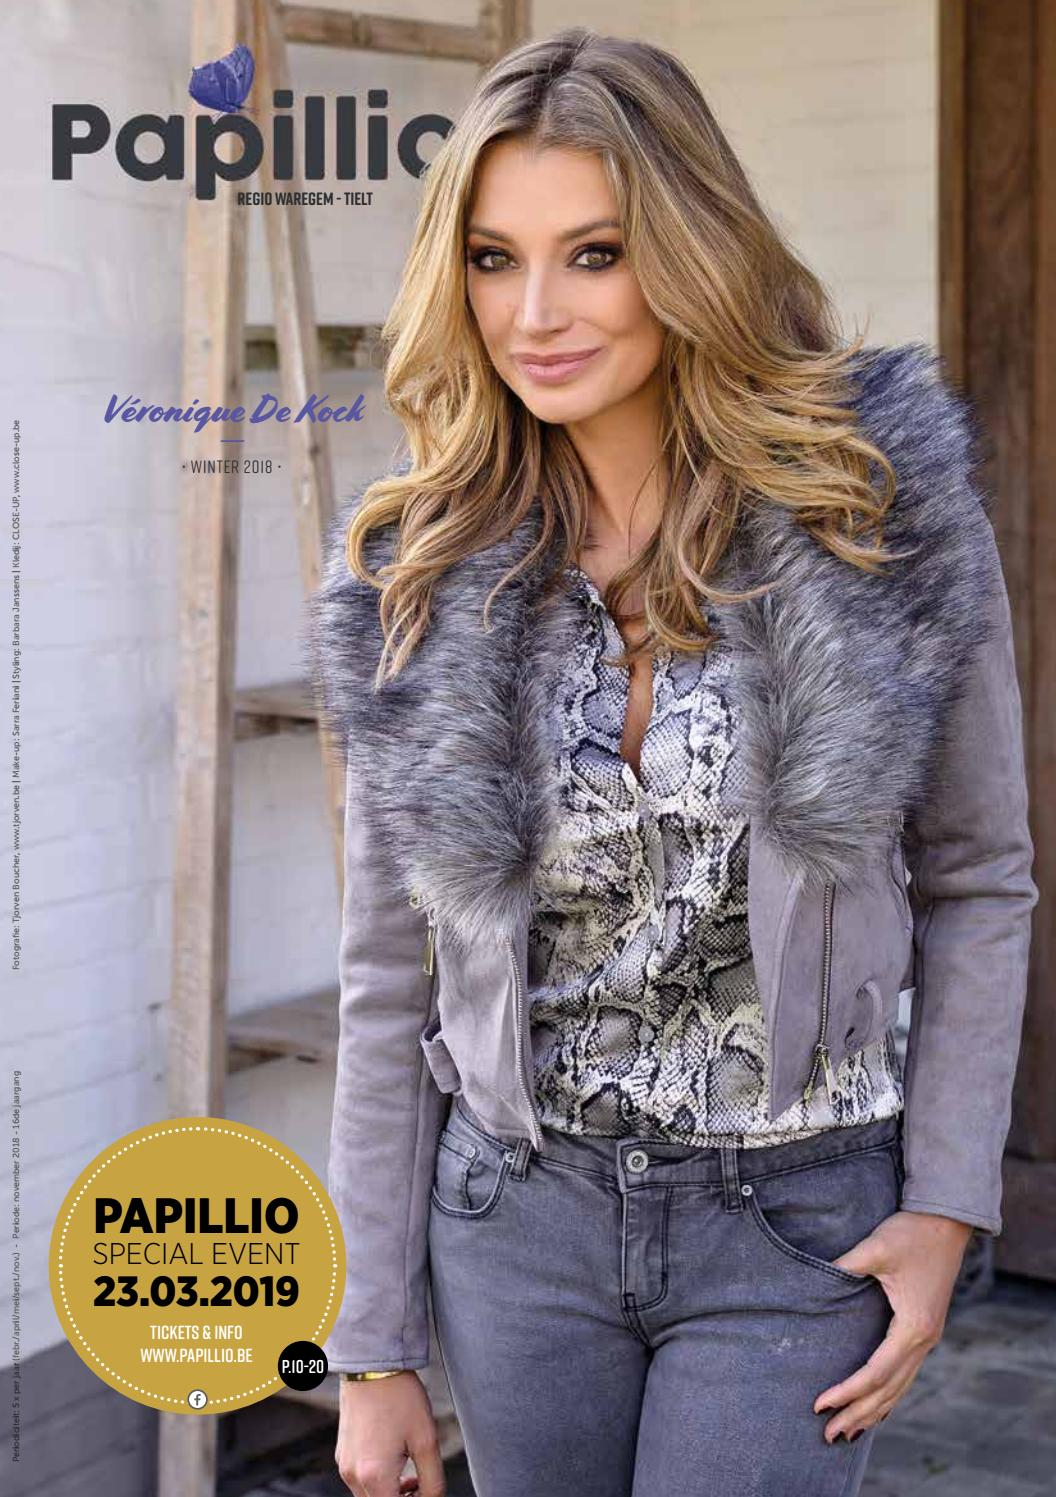 2ea4791b7b7487 Papilio-magazine winter 2018 regio Waregem-Tielt by Papillio - issuu